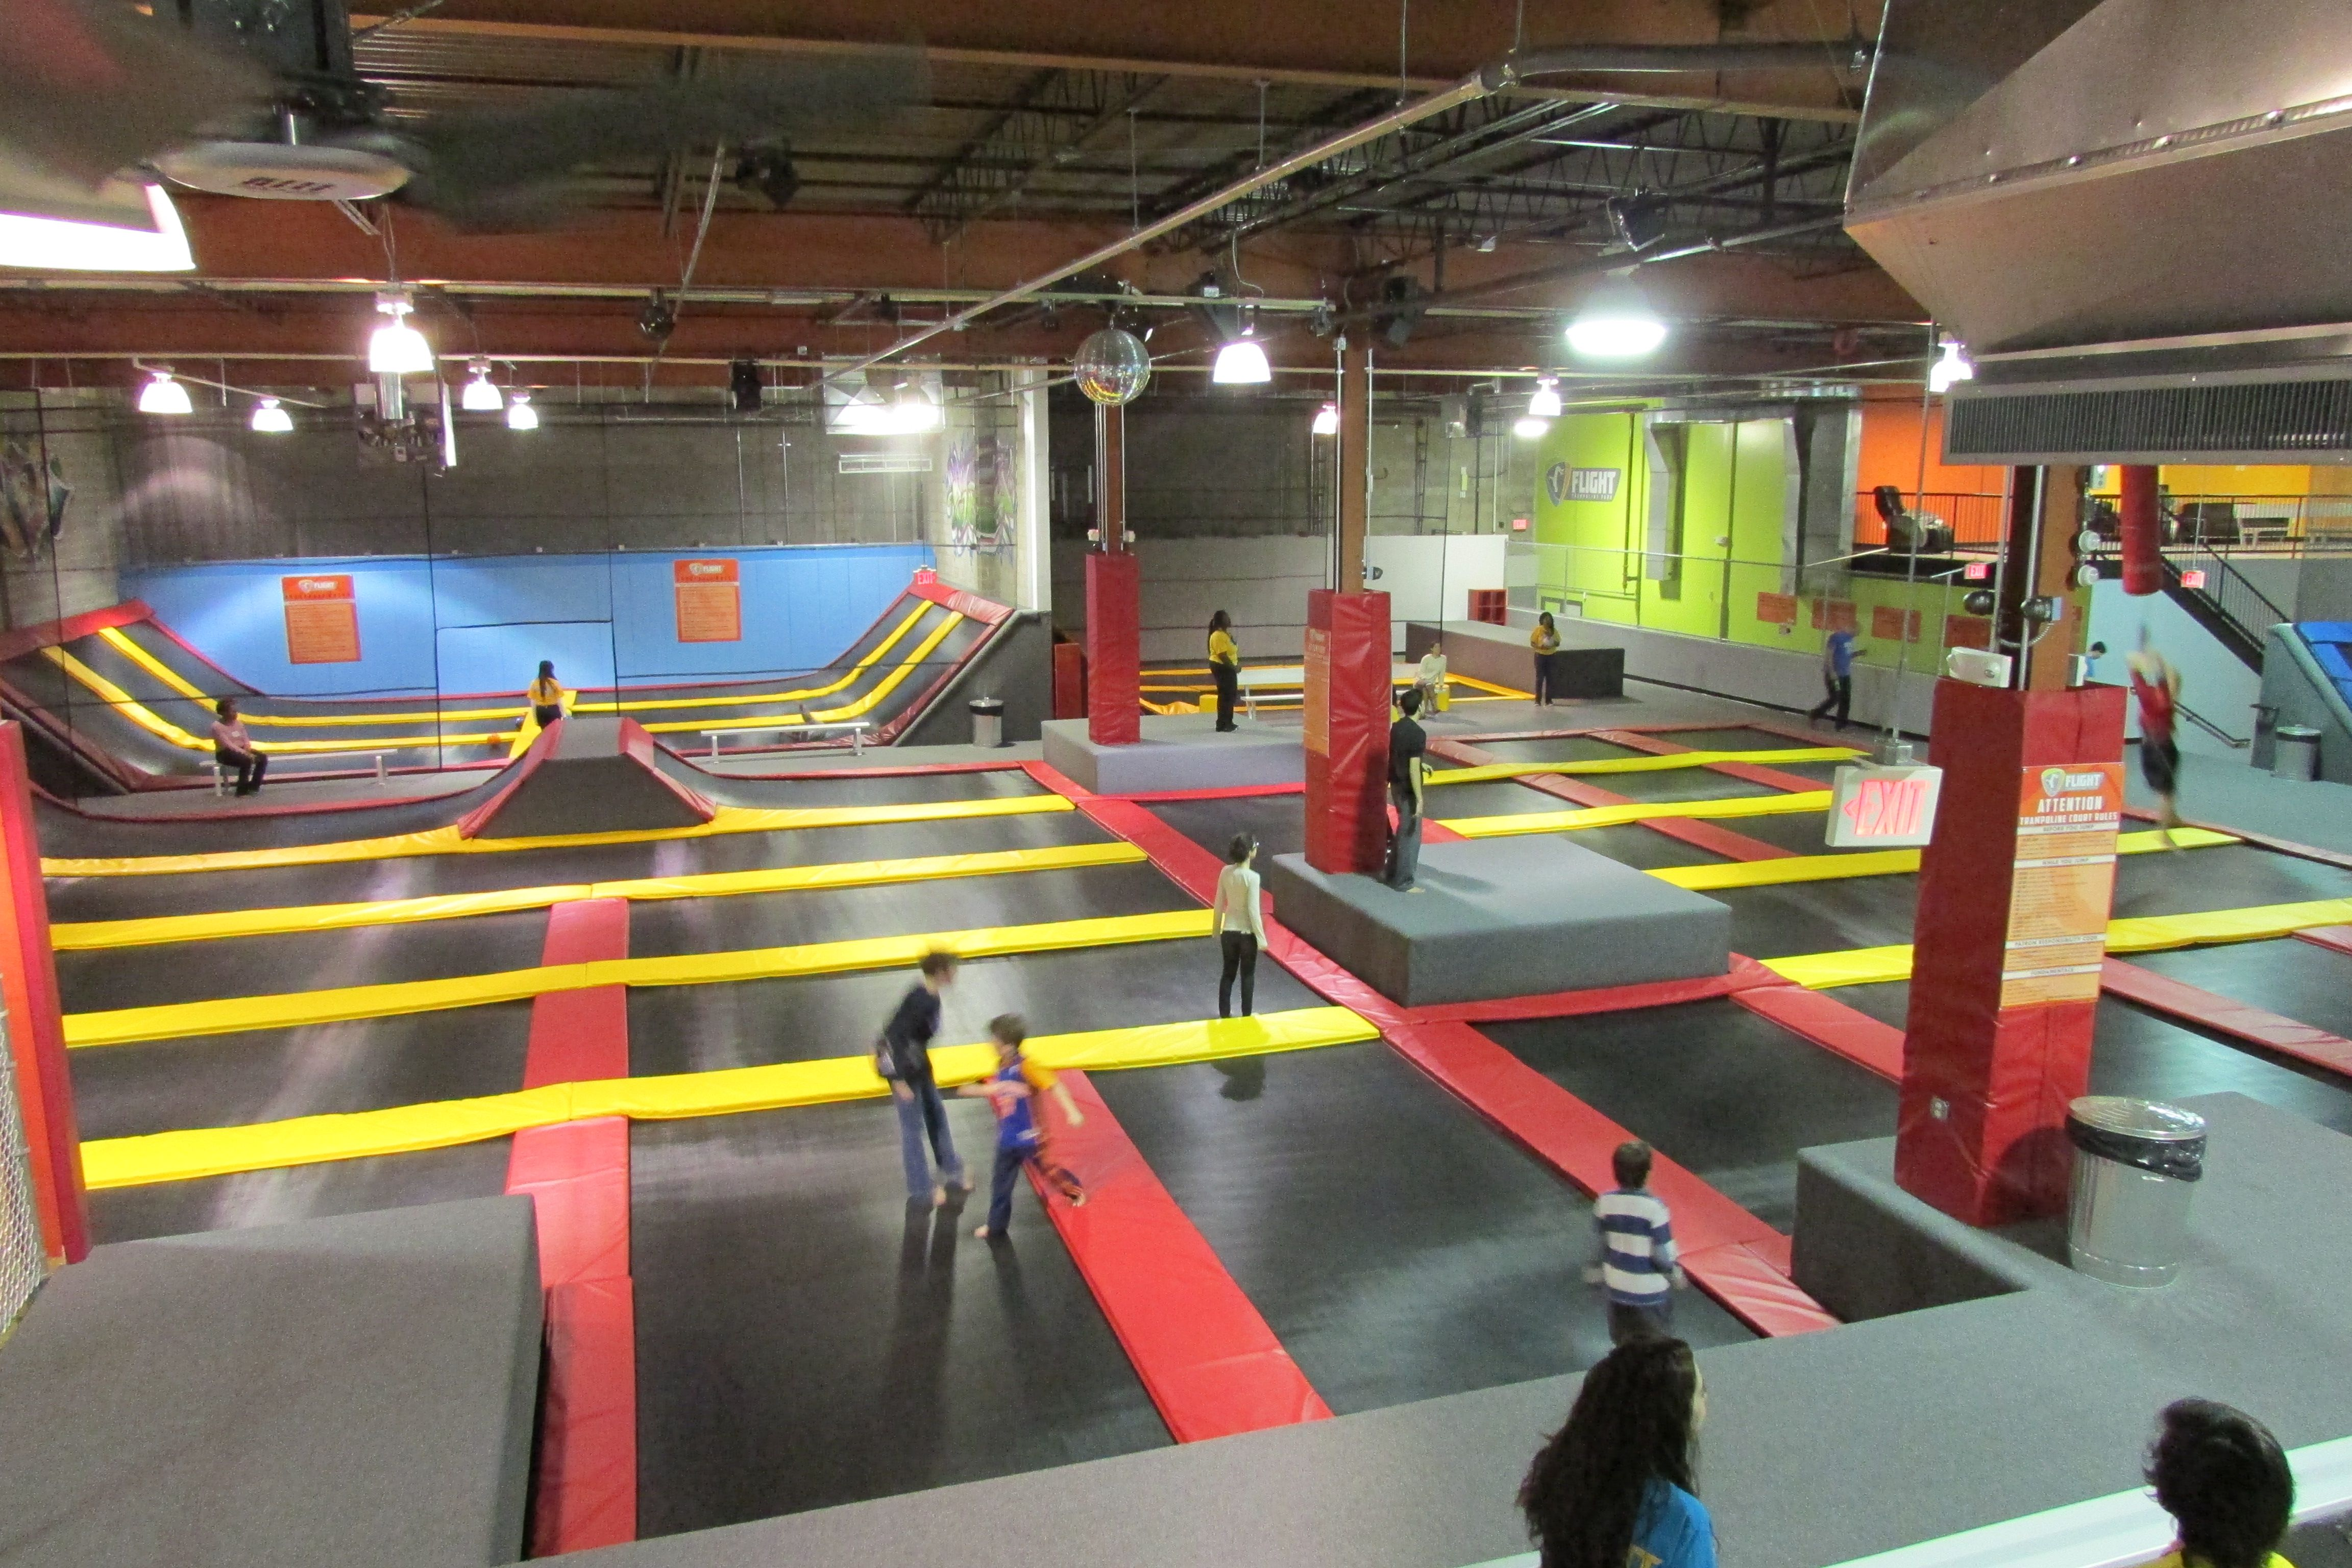 Indoor trampoline & bounce facility